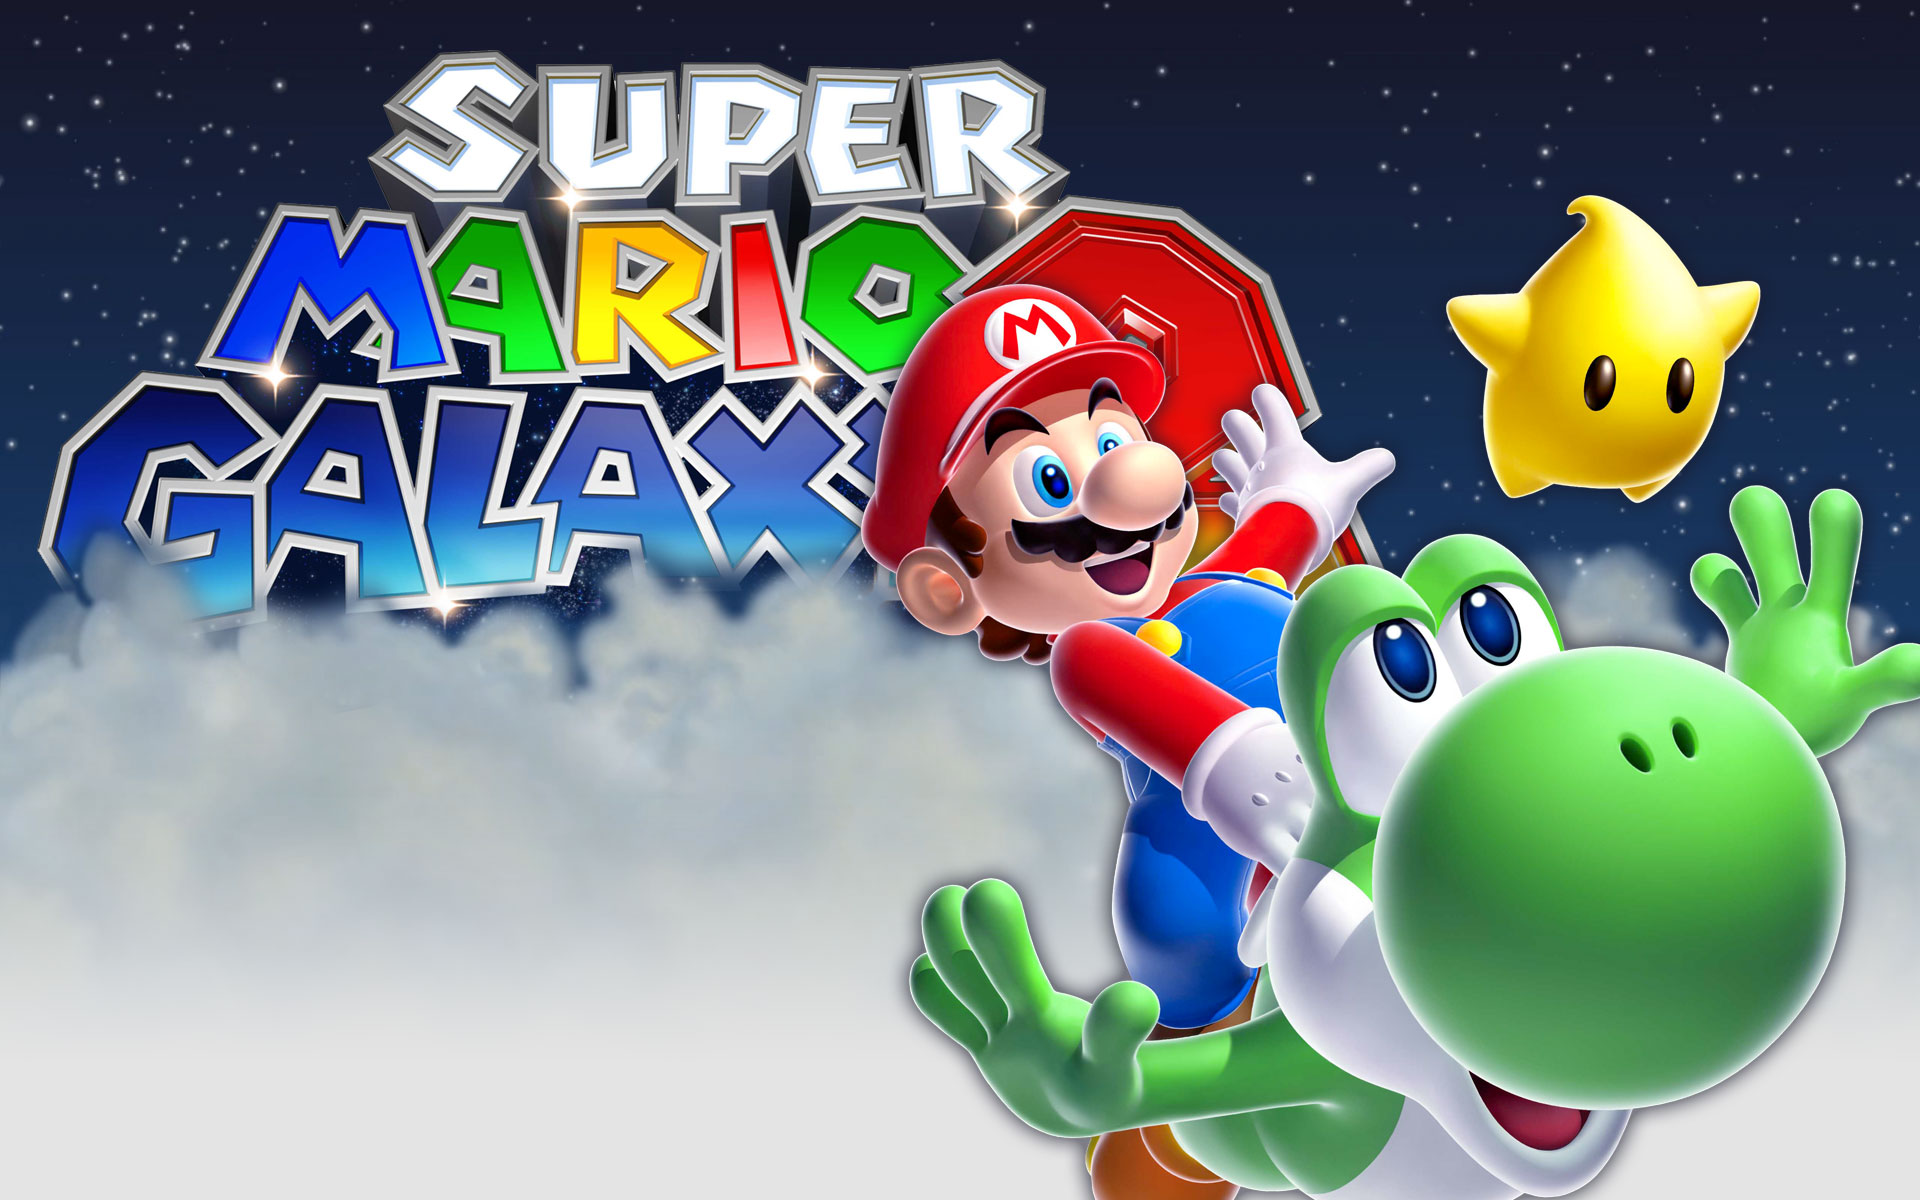 Super Mario Galaxy 2 Wallpaper Video Games Blogger